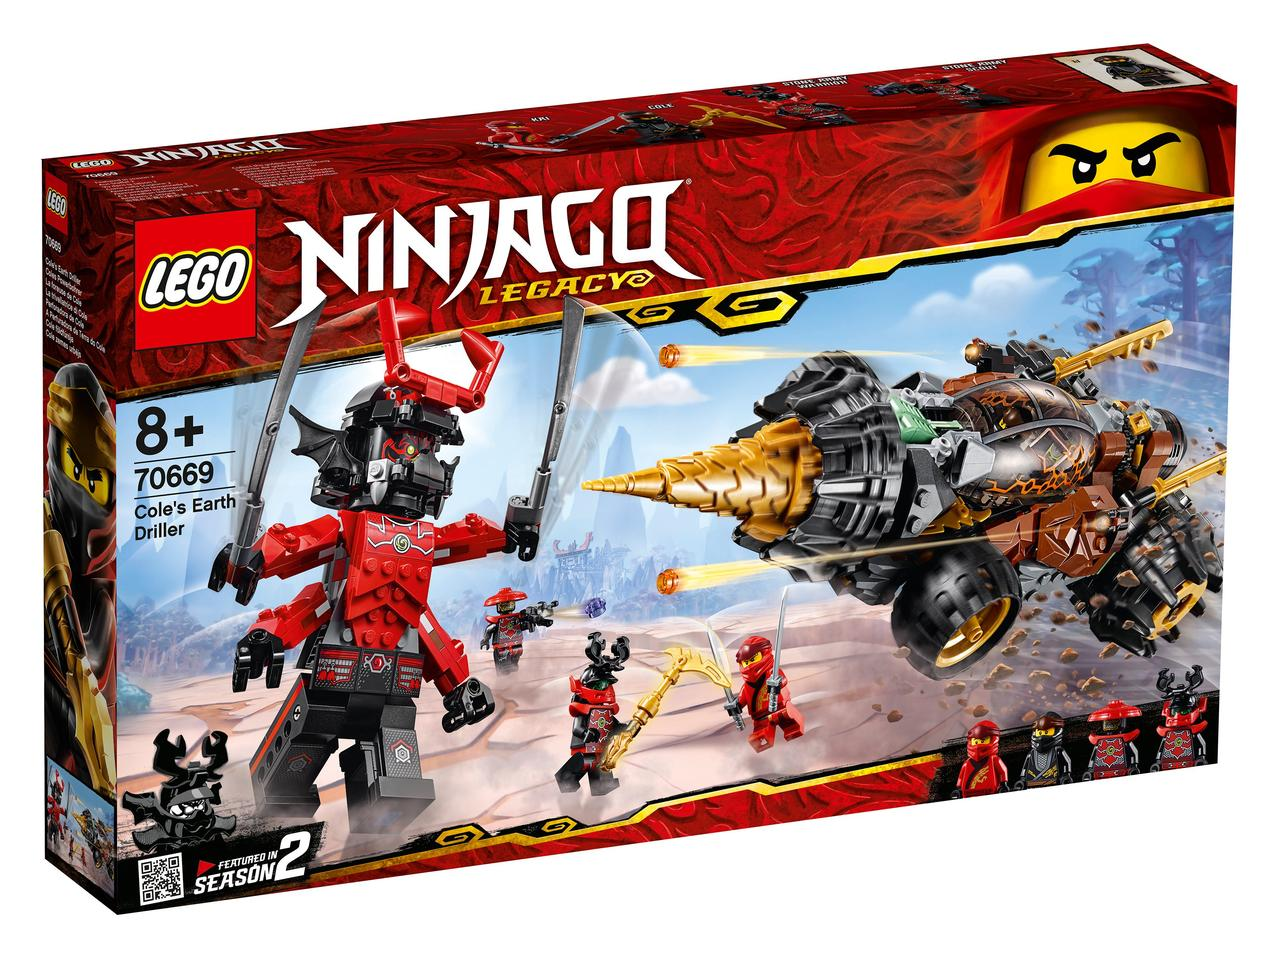 70669 Lego Ninjago Земляной бур Коула, Лего Ниндзяго